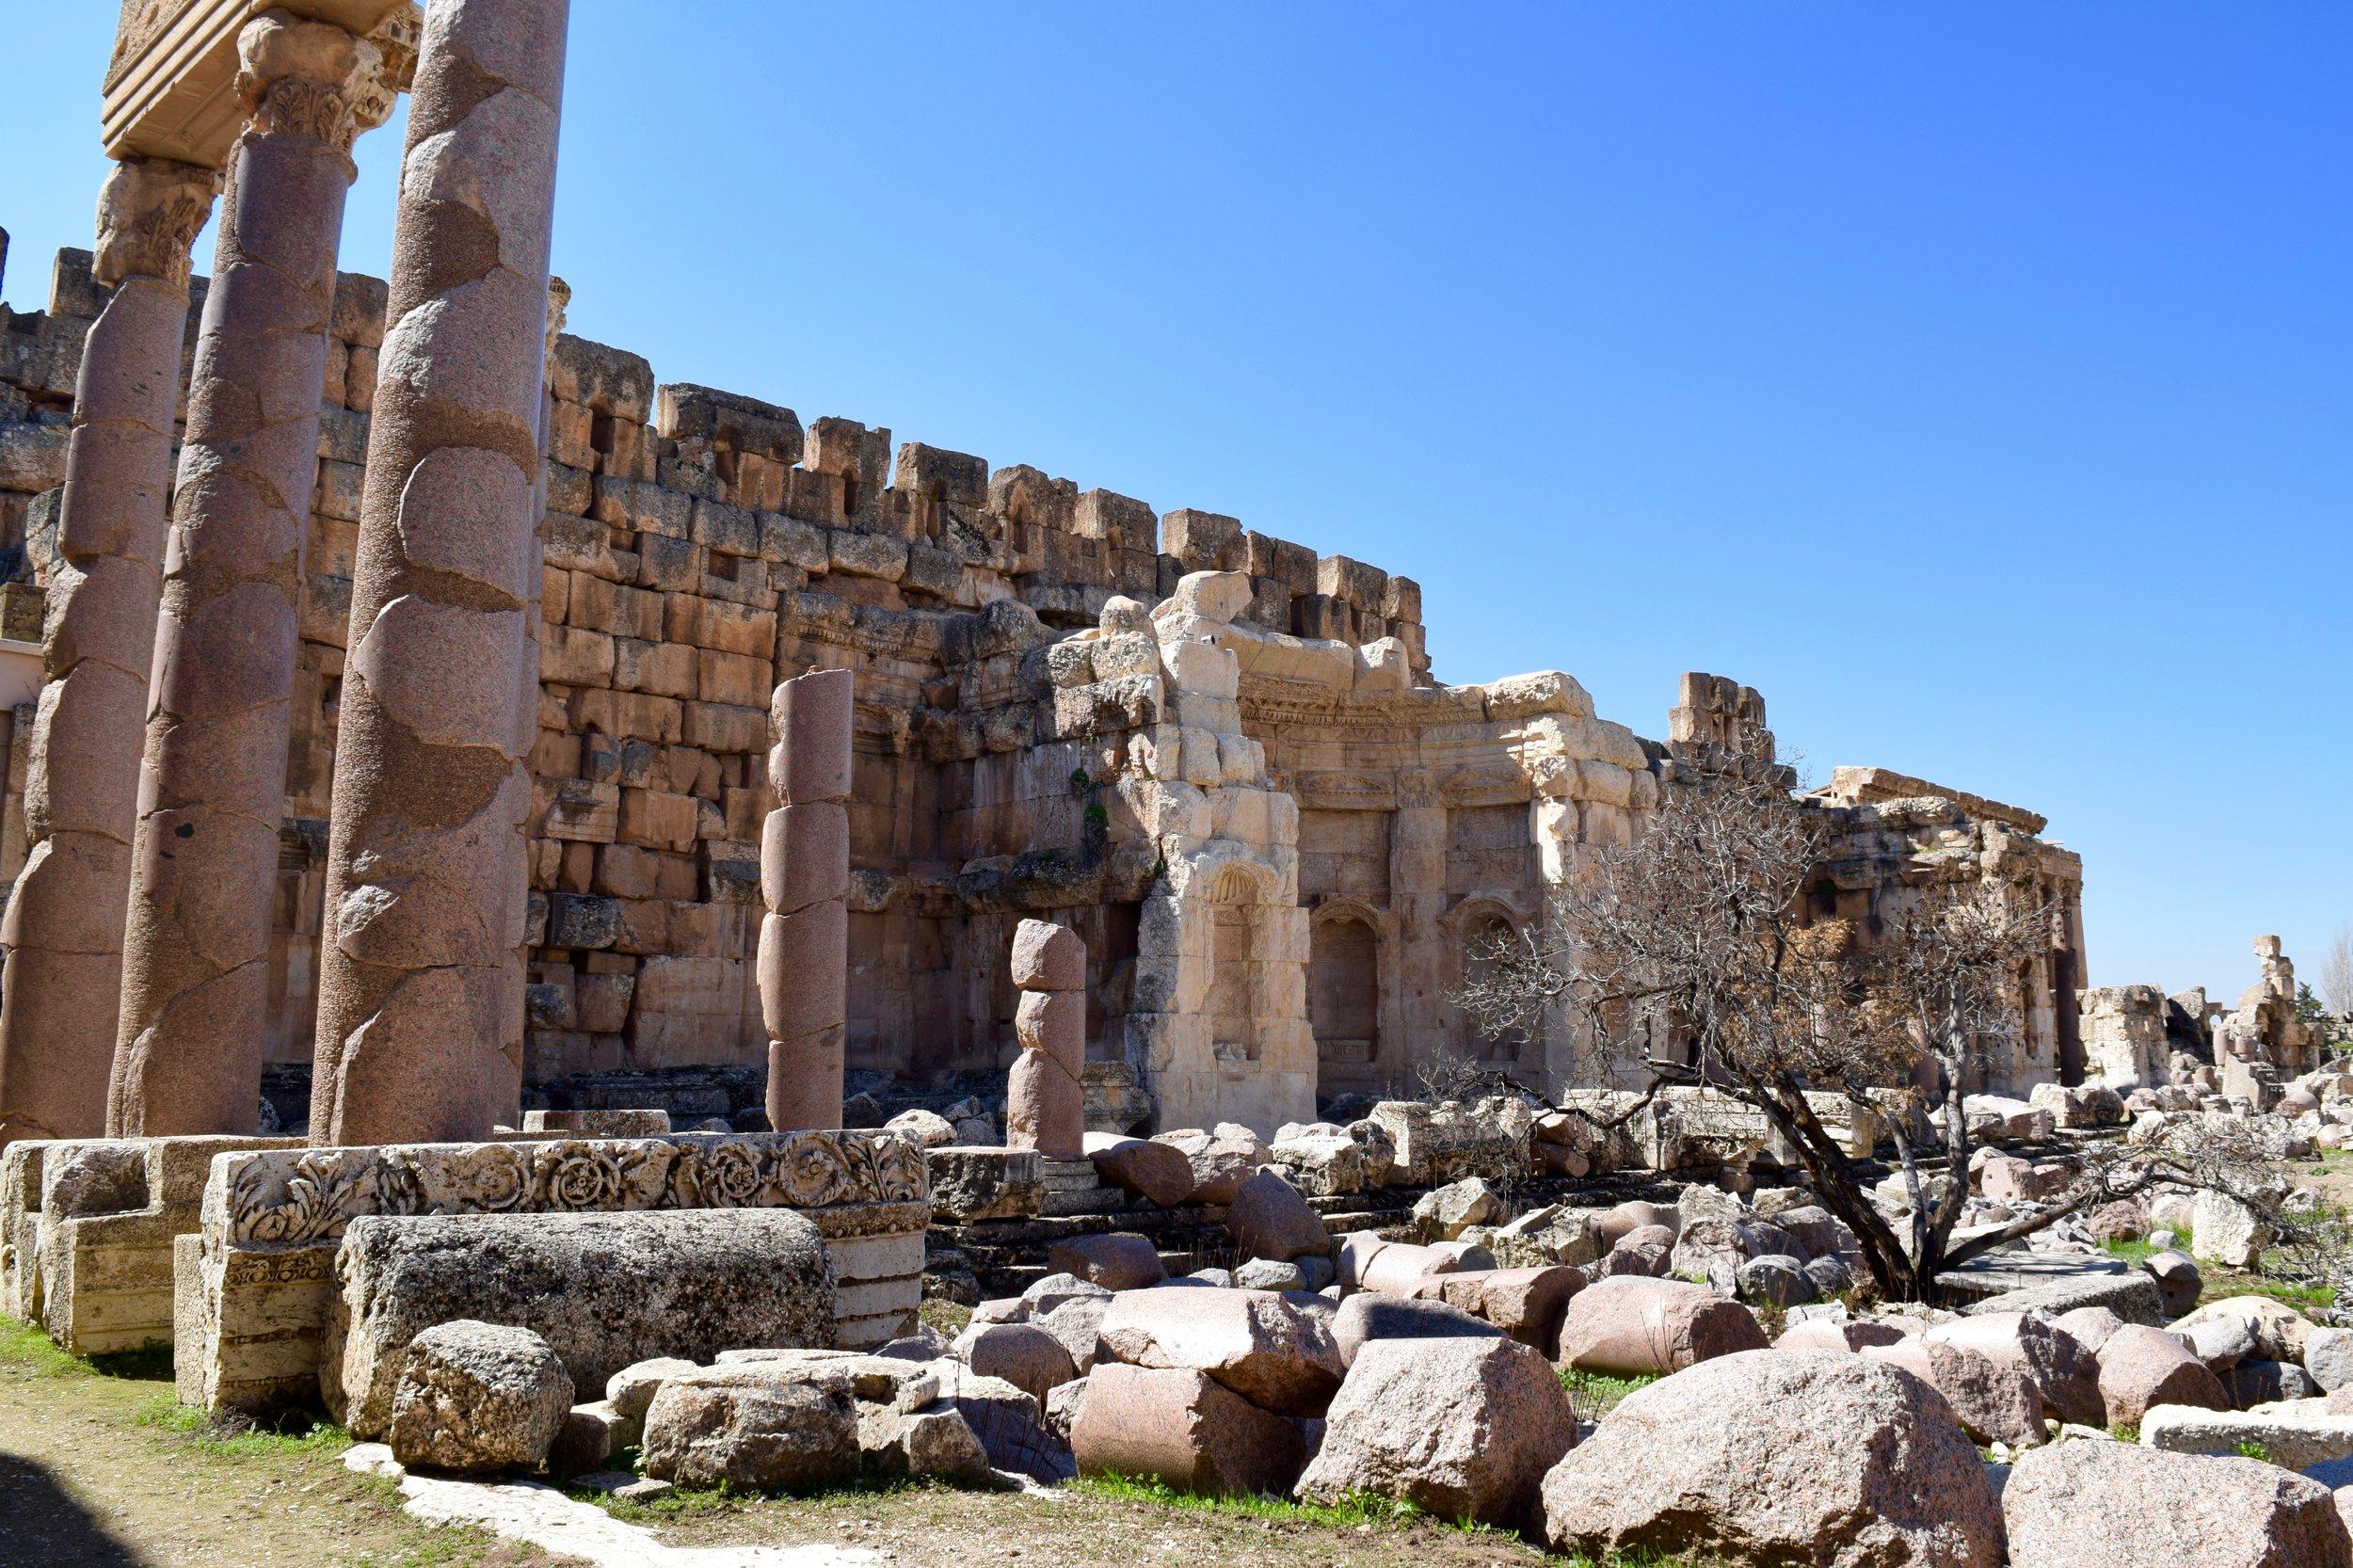 Portico in the Great Courtyard, Baalbek